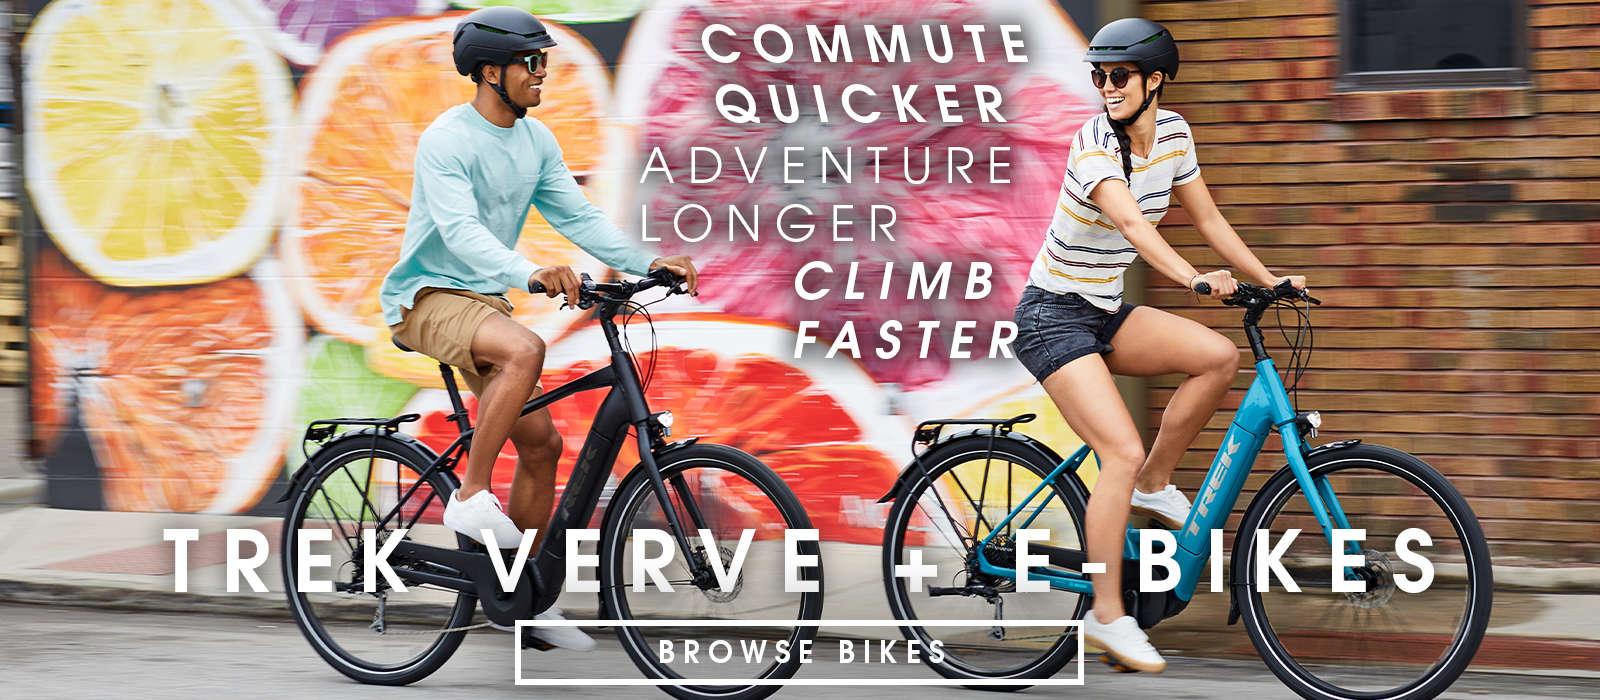 Trek Verve Bikes